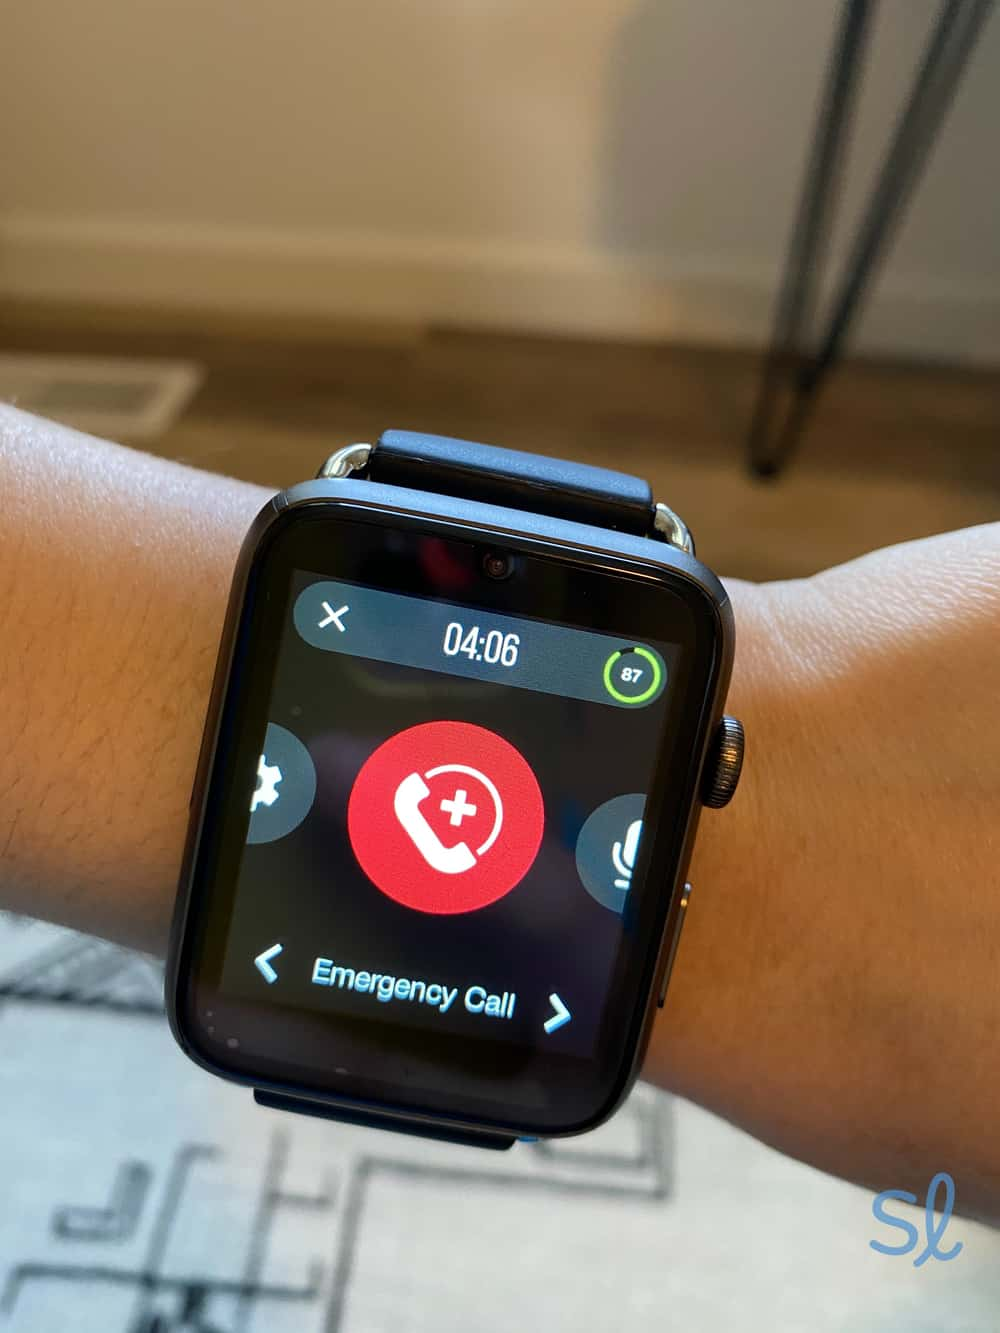 WellBe Smartwatch emergency button